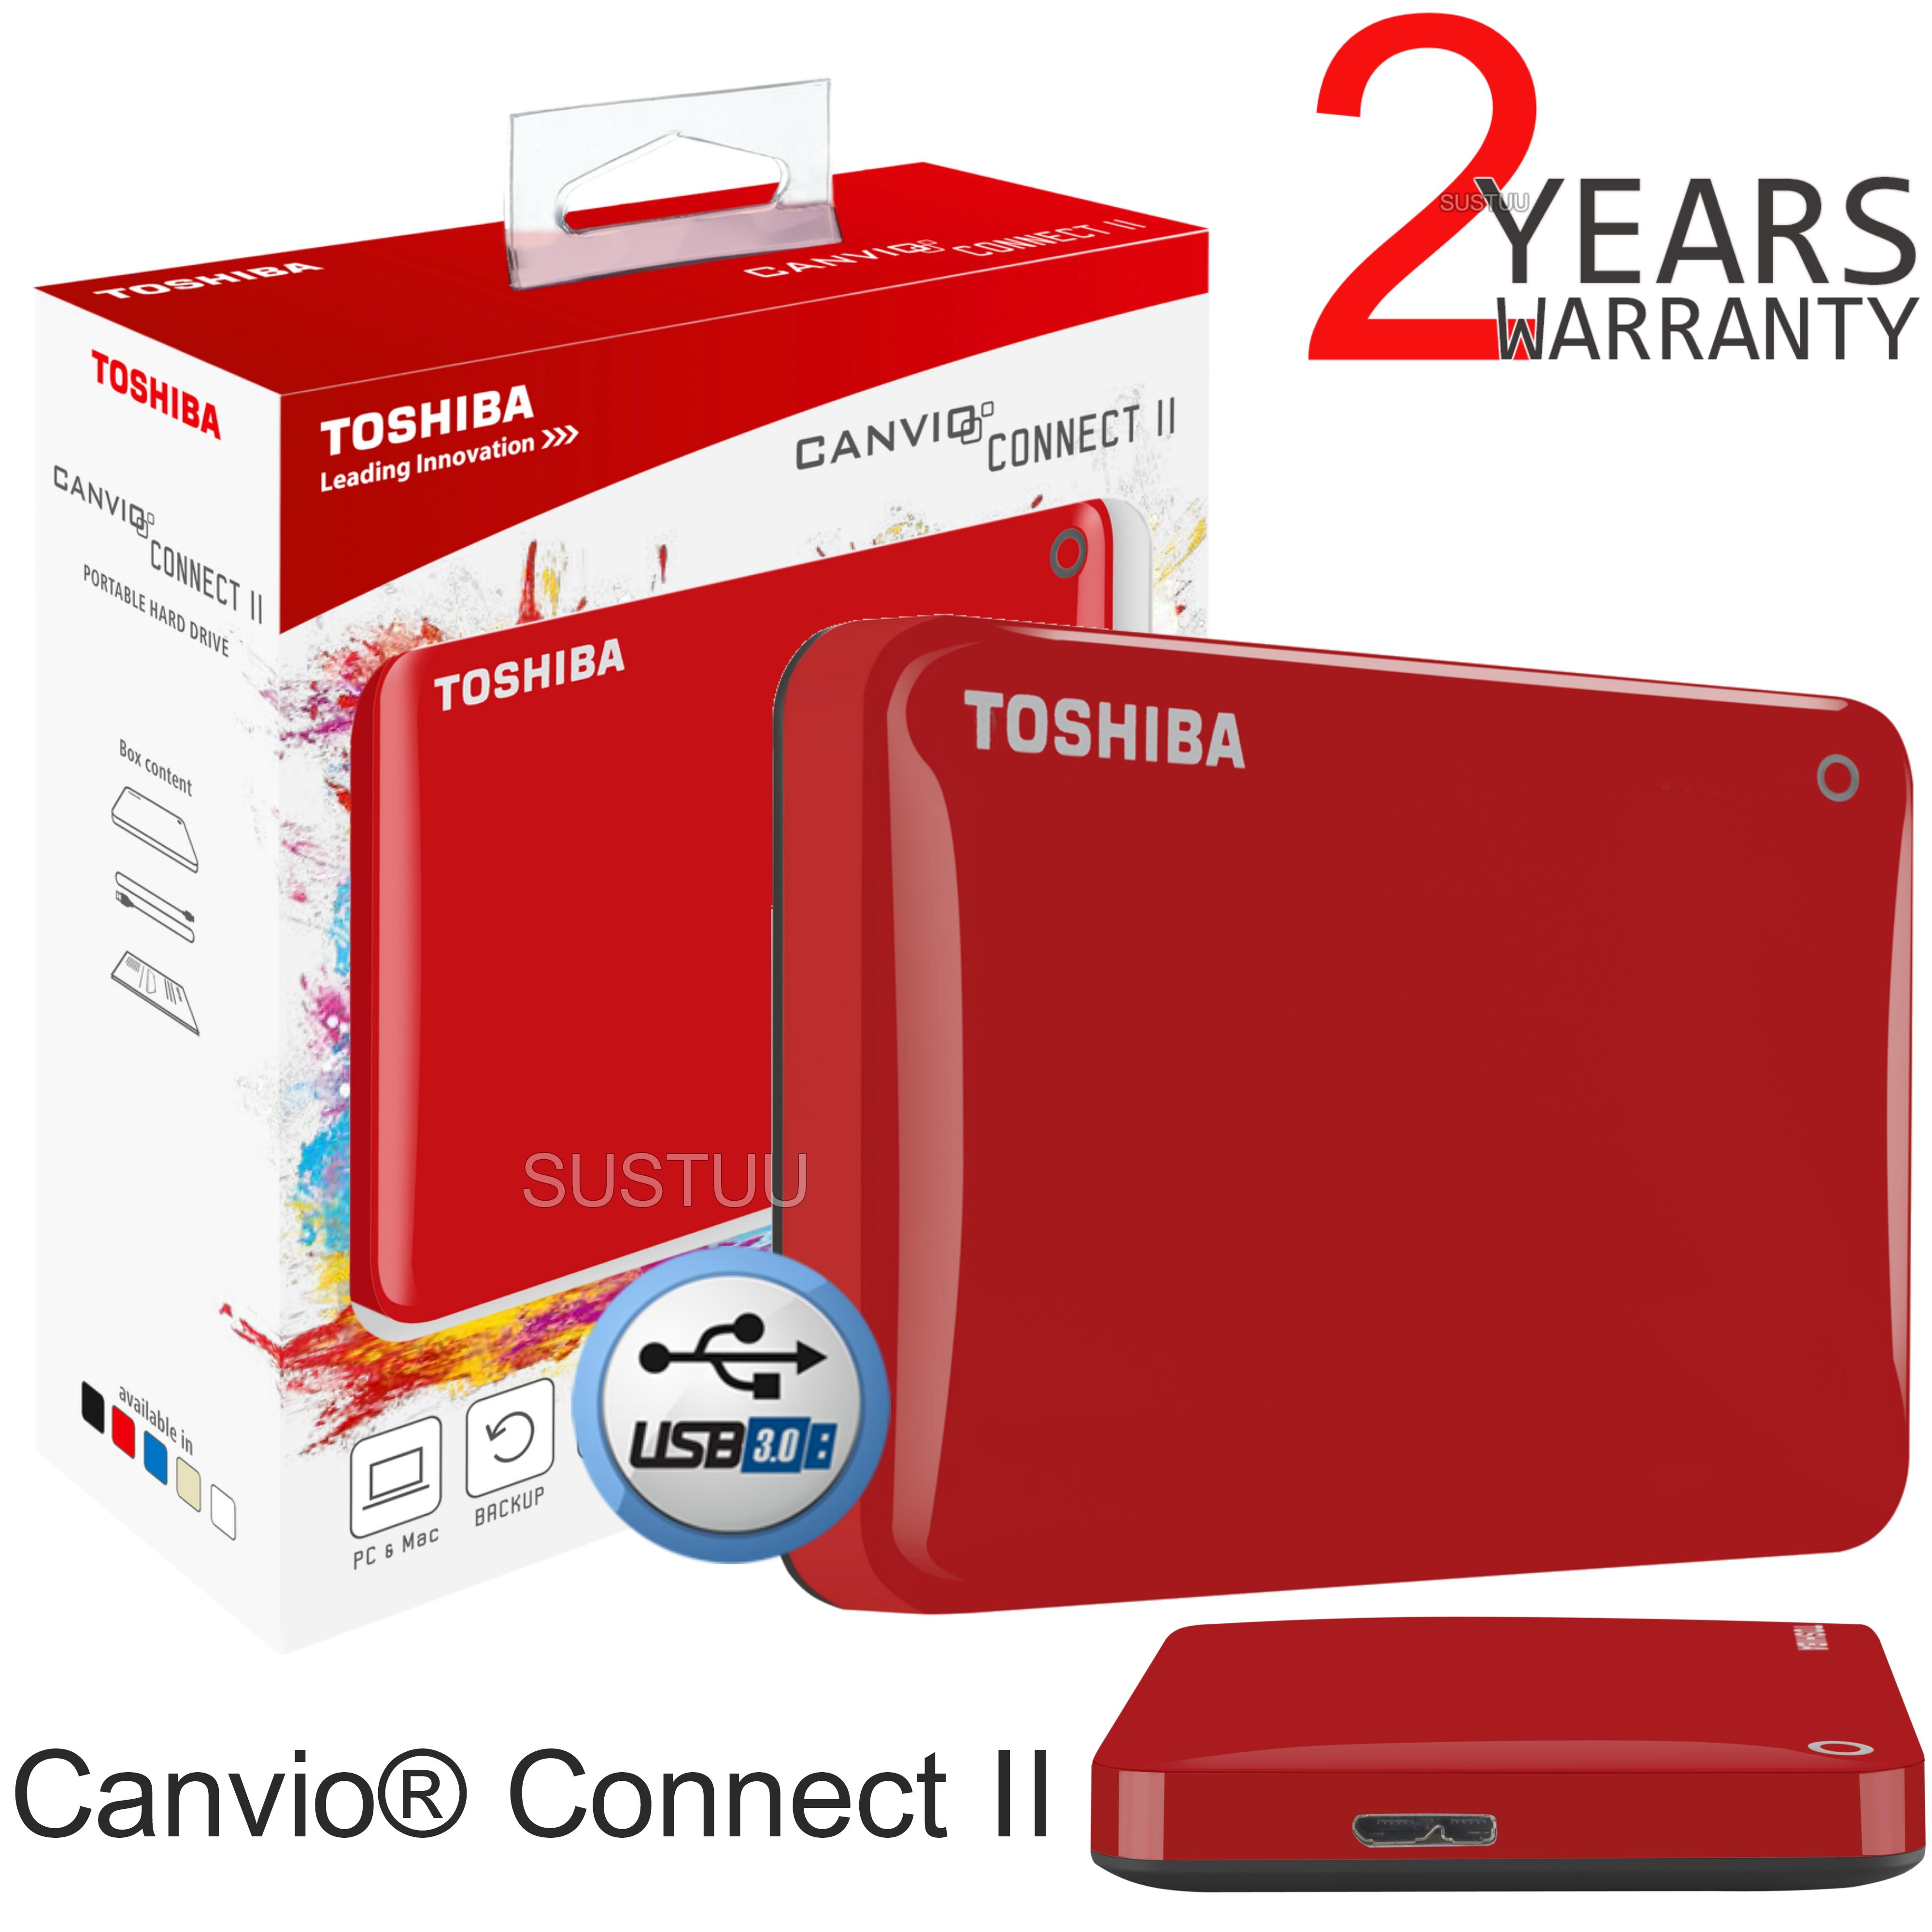 Toshiba 1tb Canvio Connect Ii Portable External Hard Drive Disk Thosiba Basic Hardisk Exsternal 25 Hdd